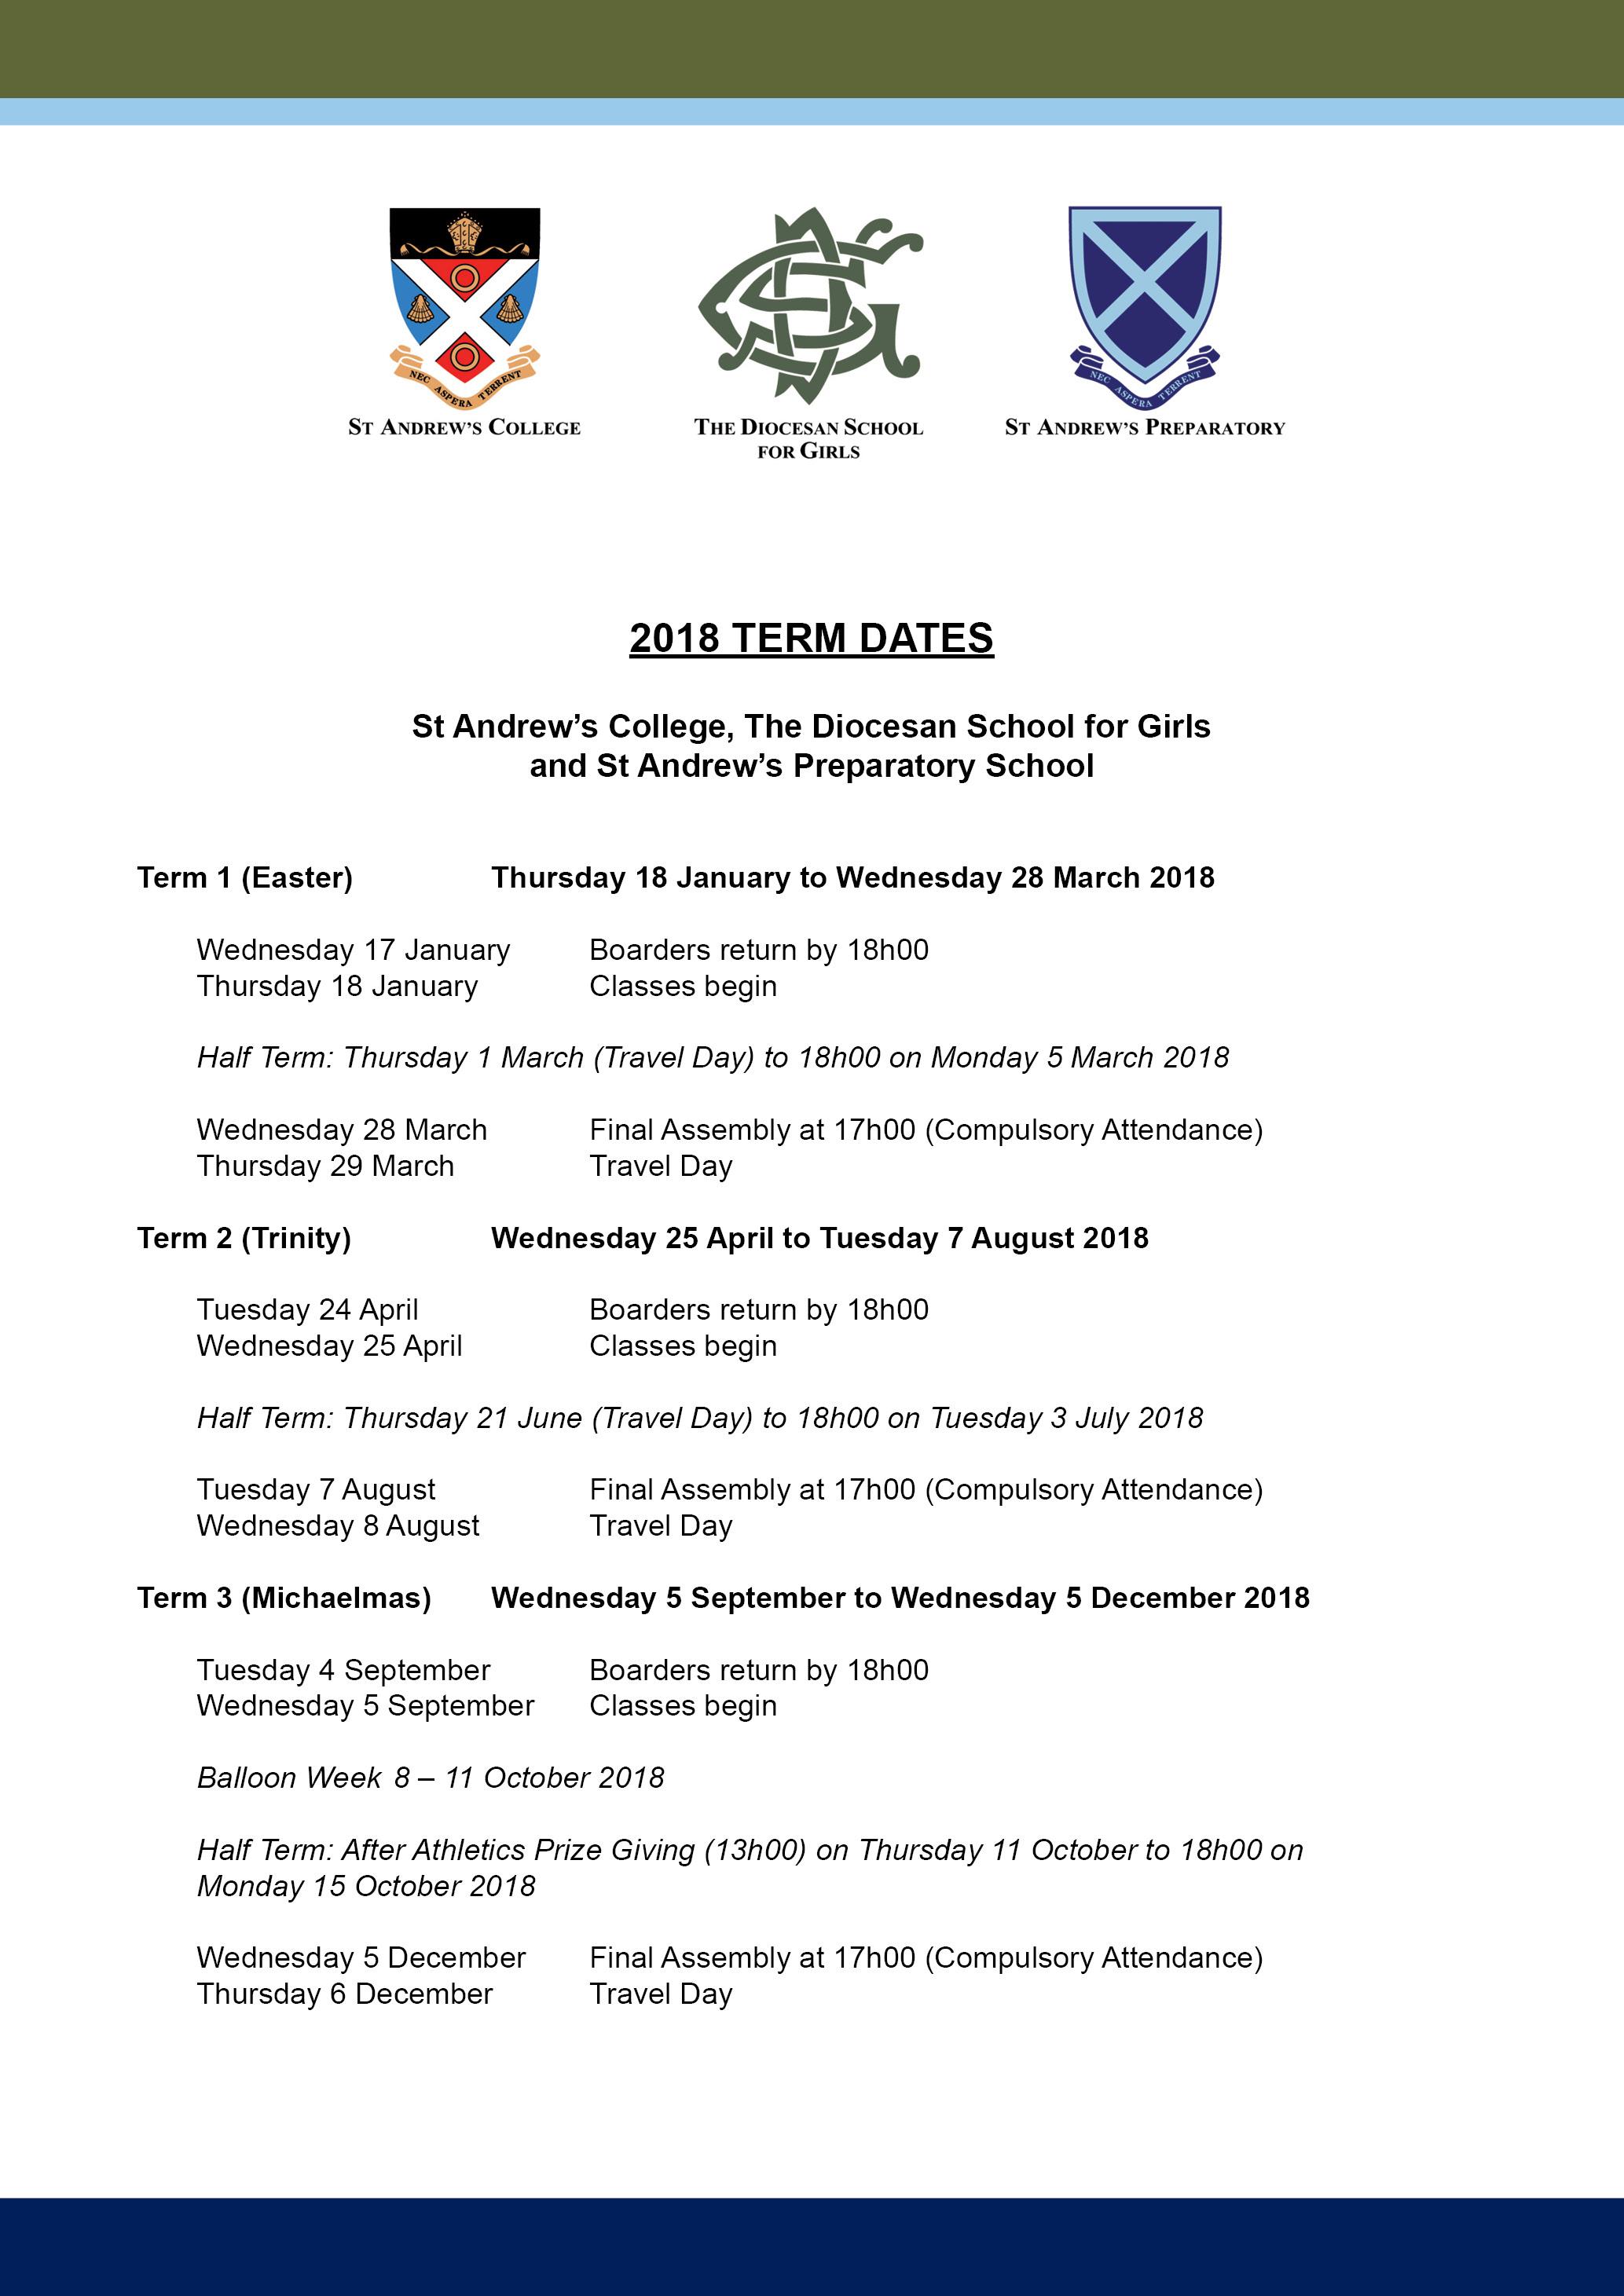 2018 Term Dates (Amended Dec 2017)